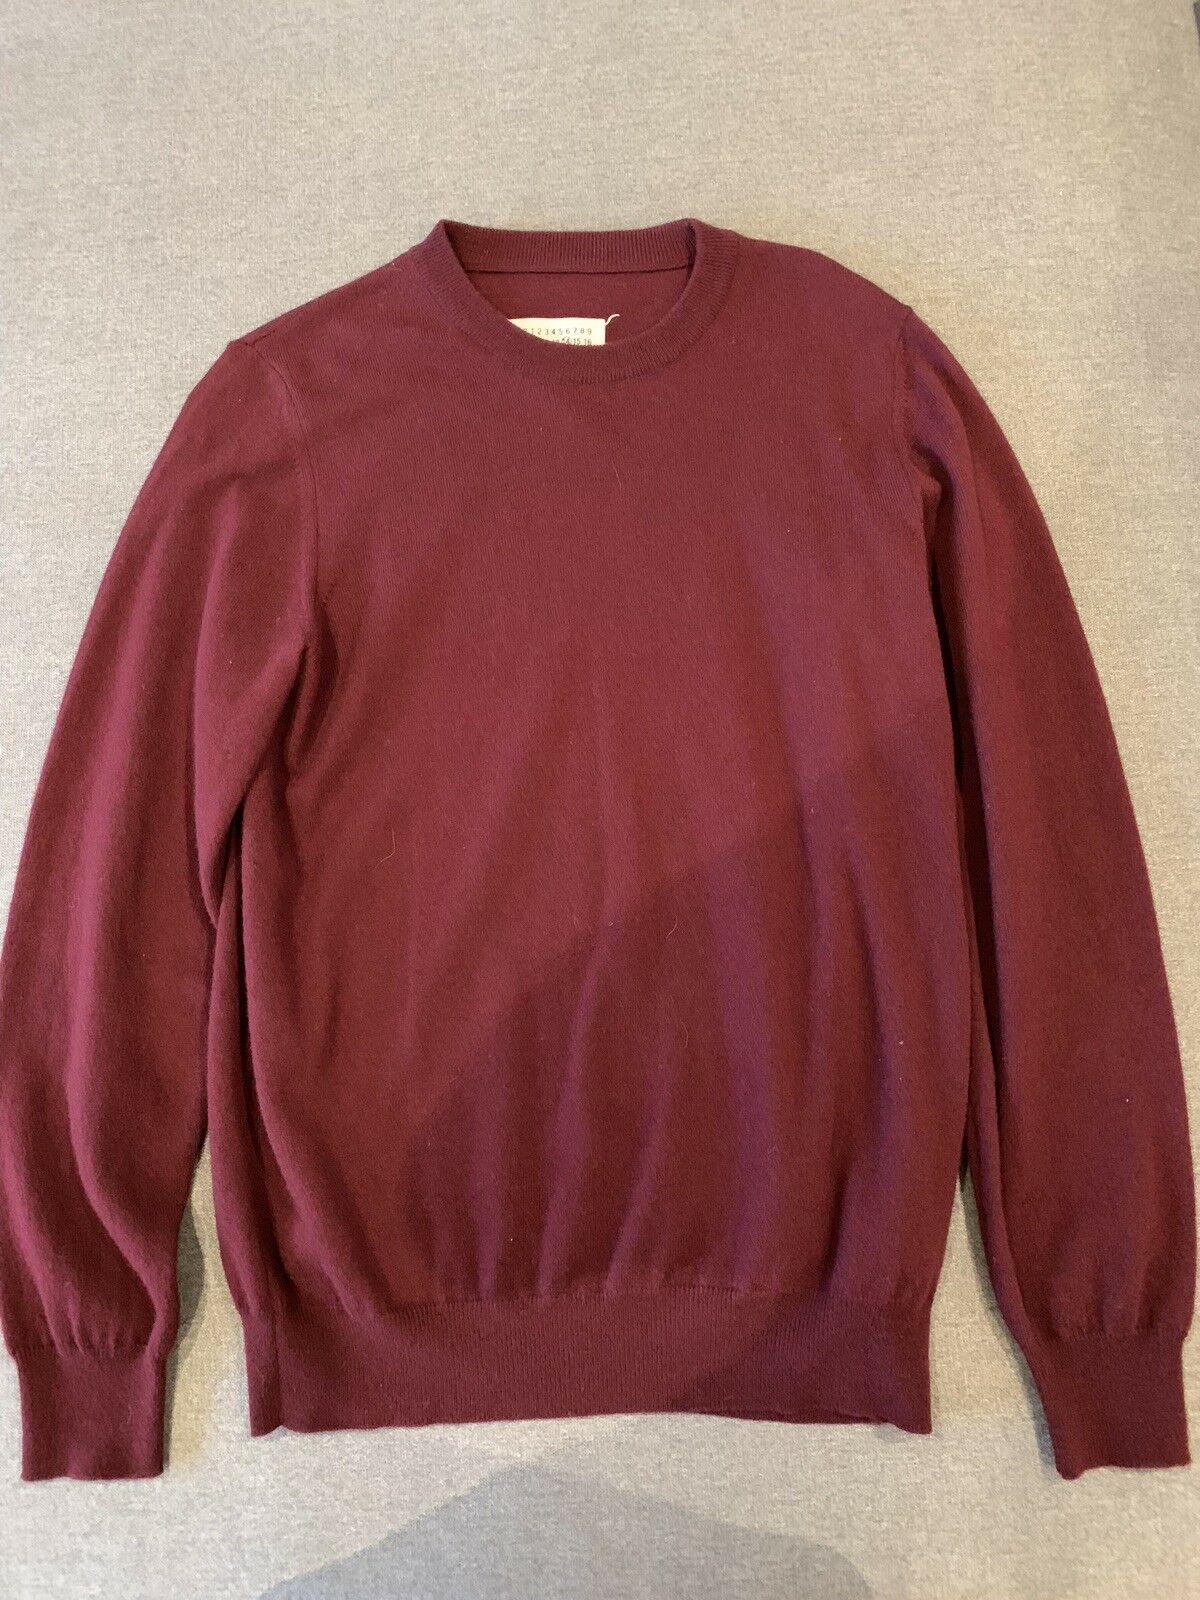 Maison Margiela Wool Sweater 48 Medium Made In